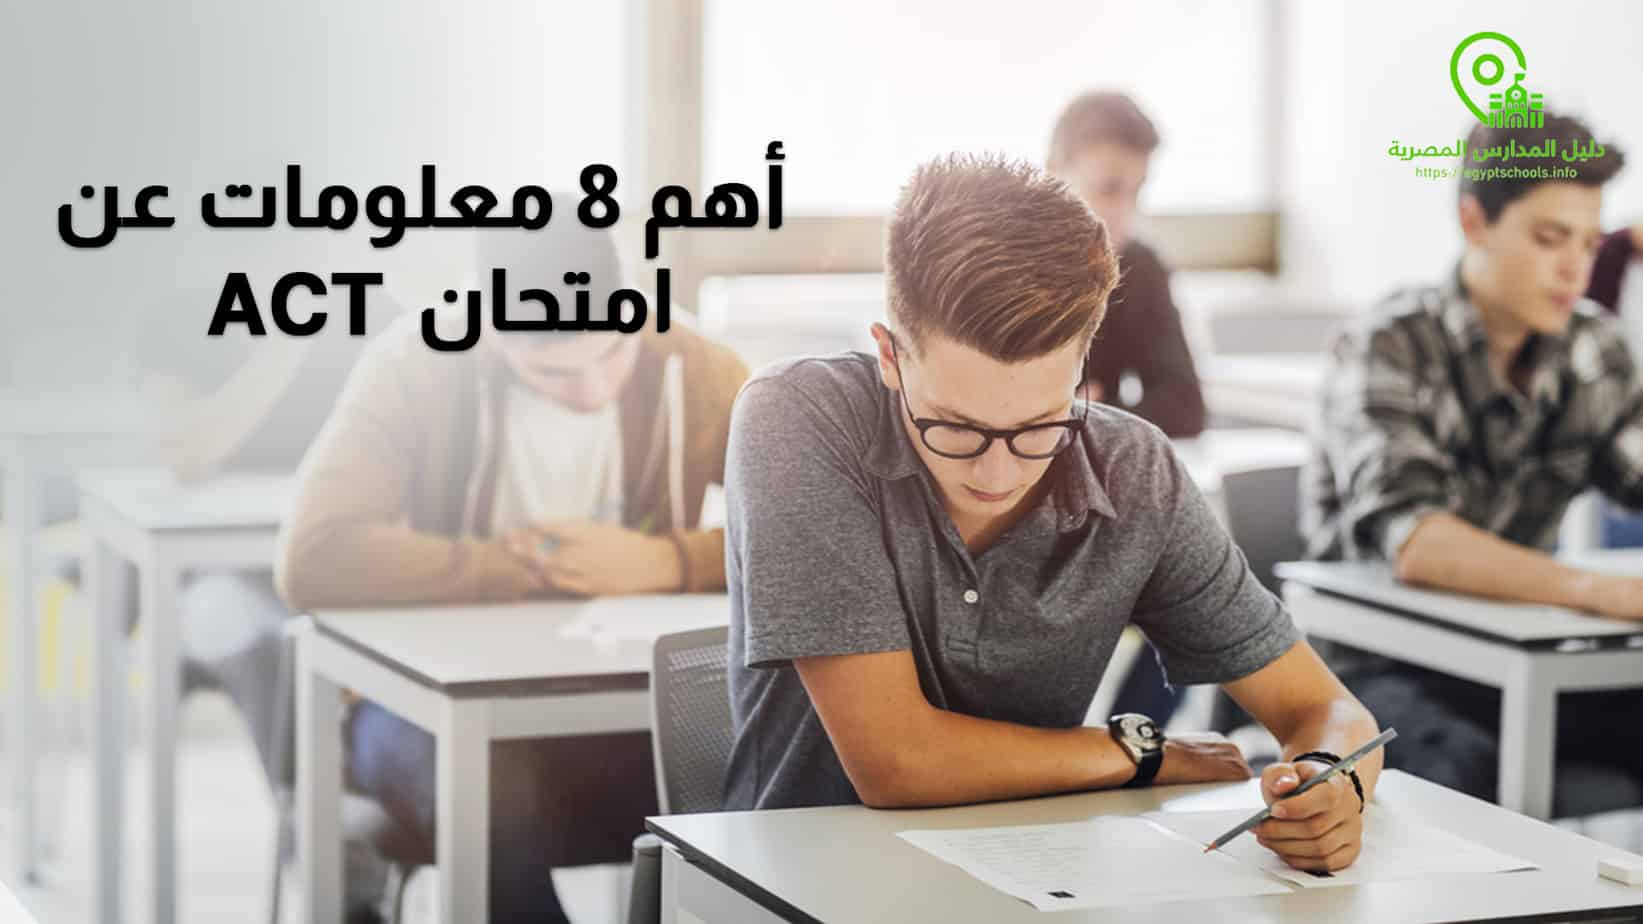 معلومات عن امتحان ACT